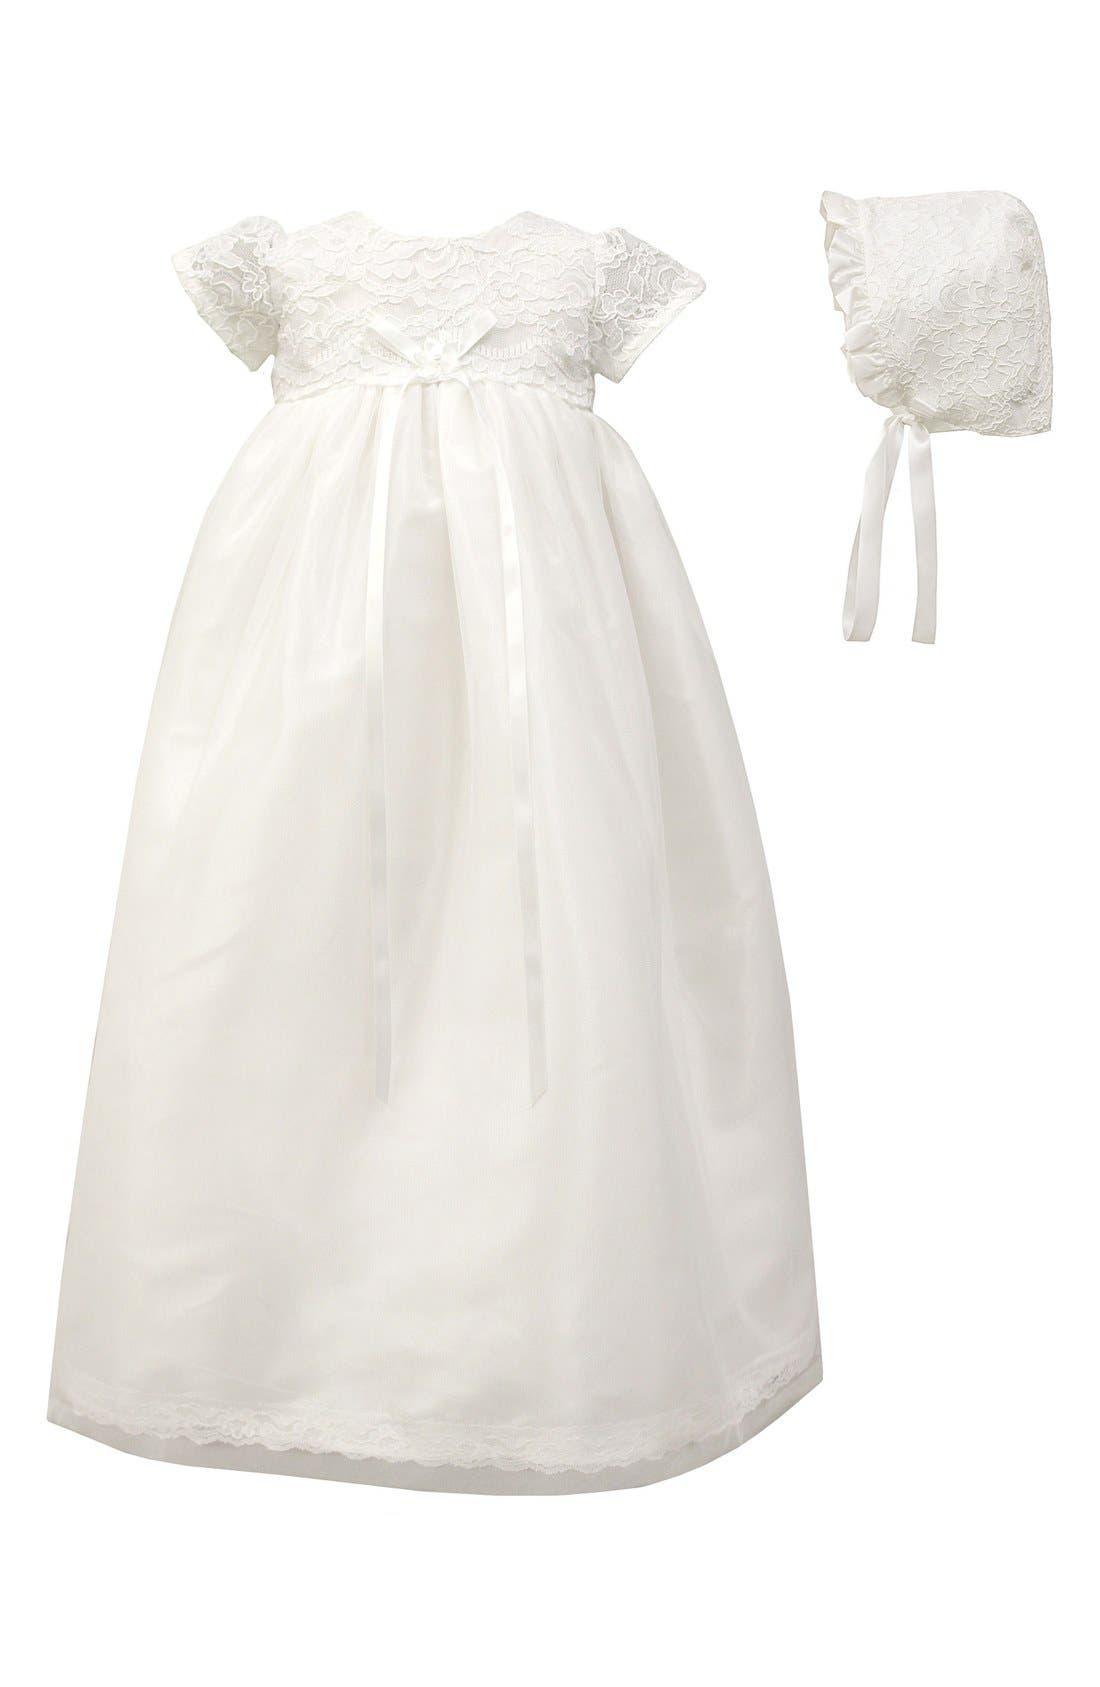 C.I. Castro & Co. Scalloped Lace Christening Gown & Bonnet Set (Baby)